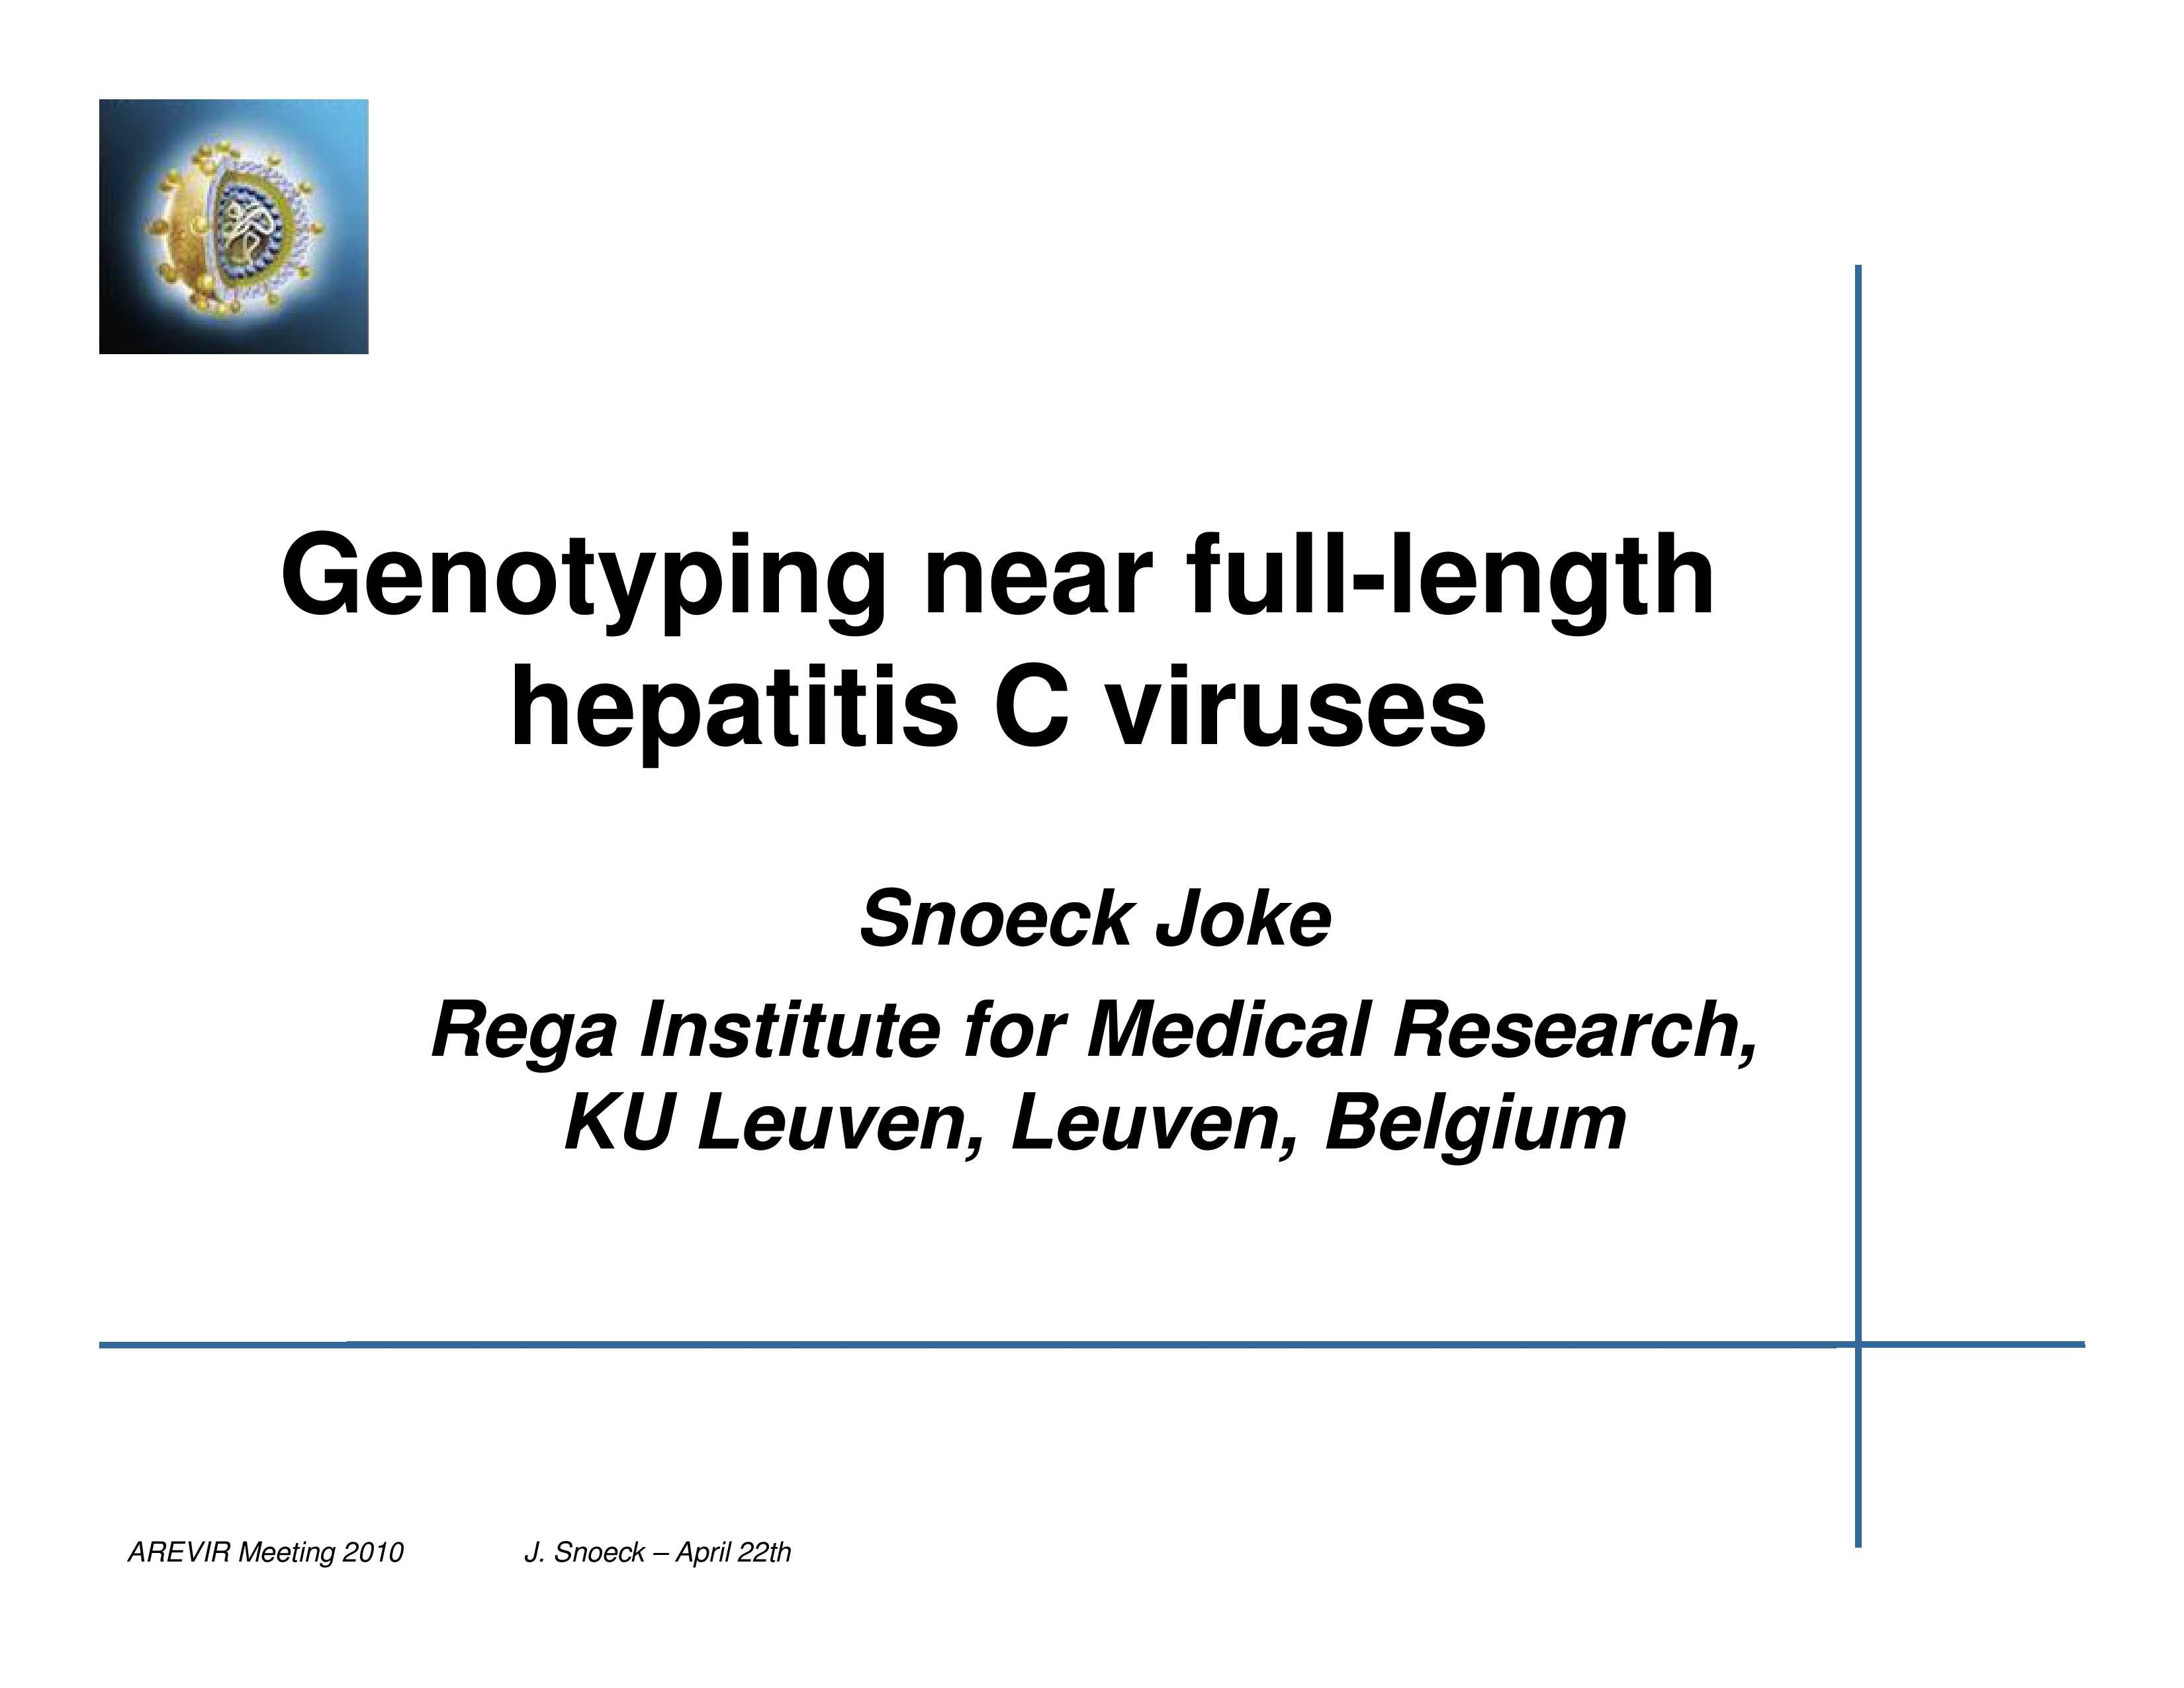 02_Snoeck_HCV_genotyping_100422-000001.jpeg